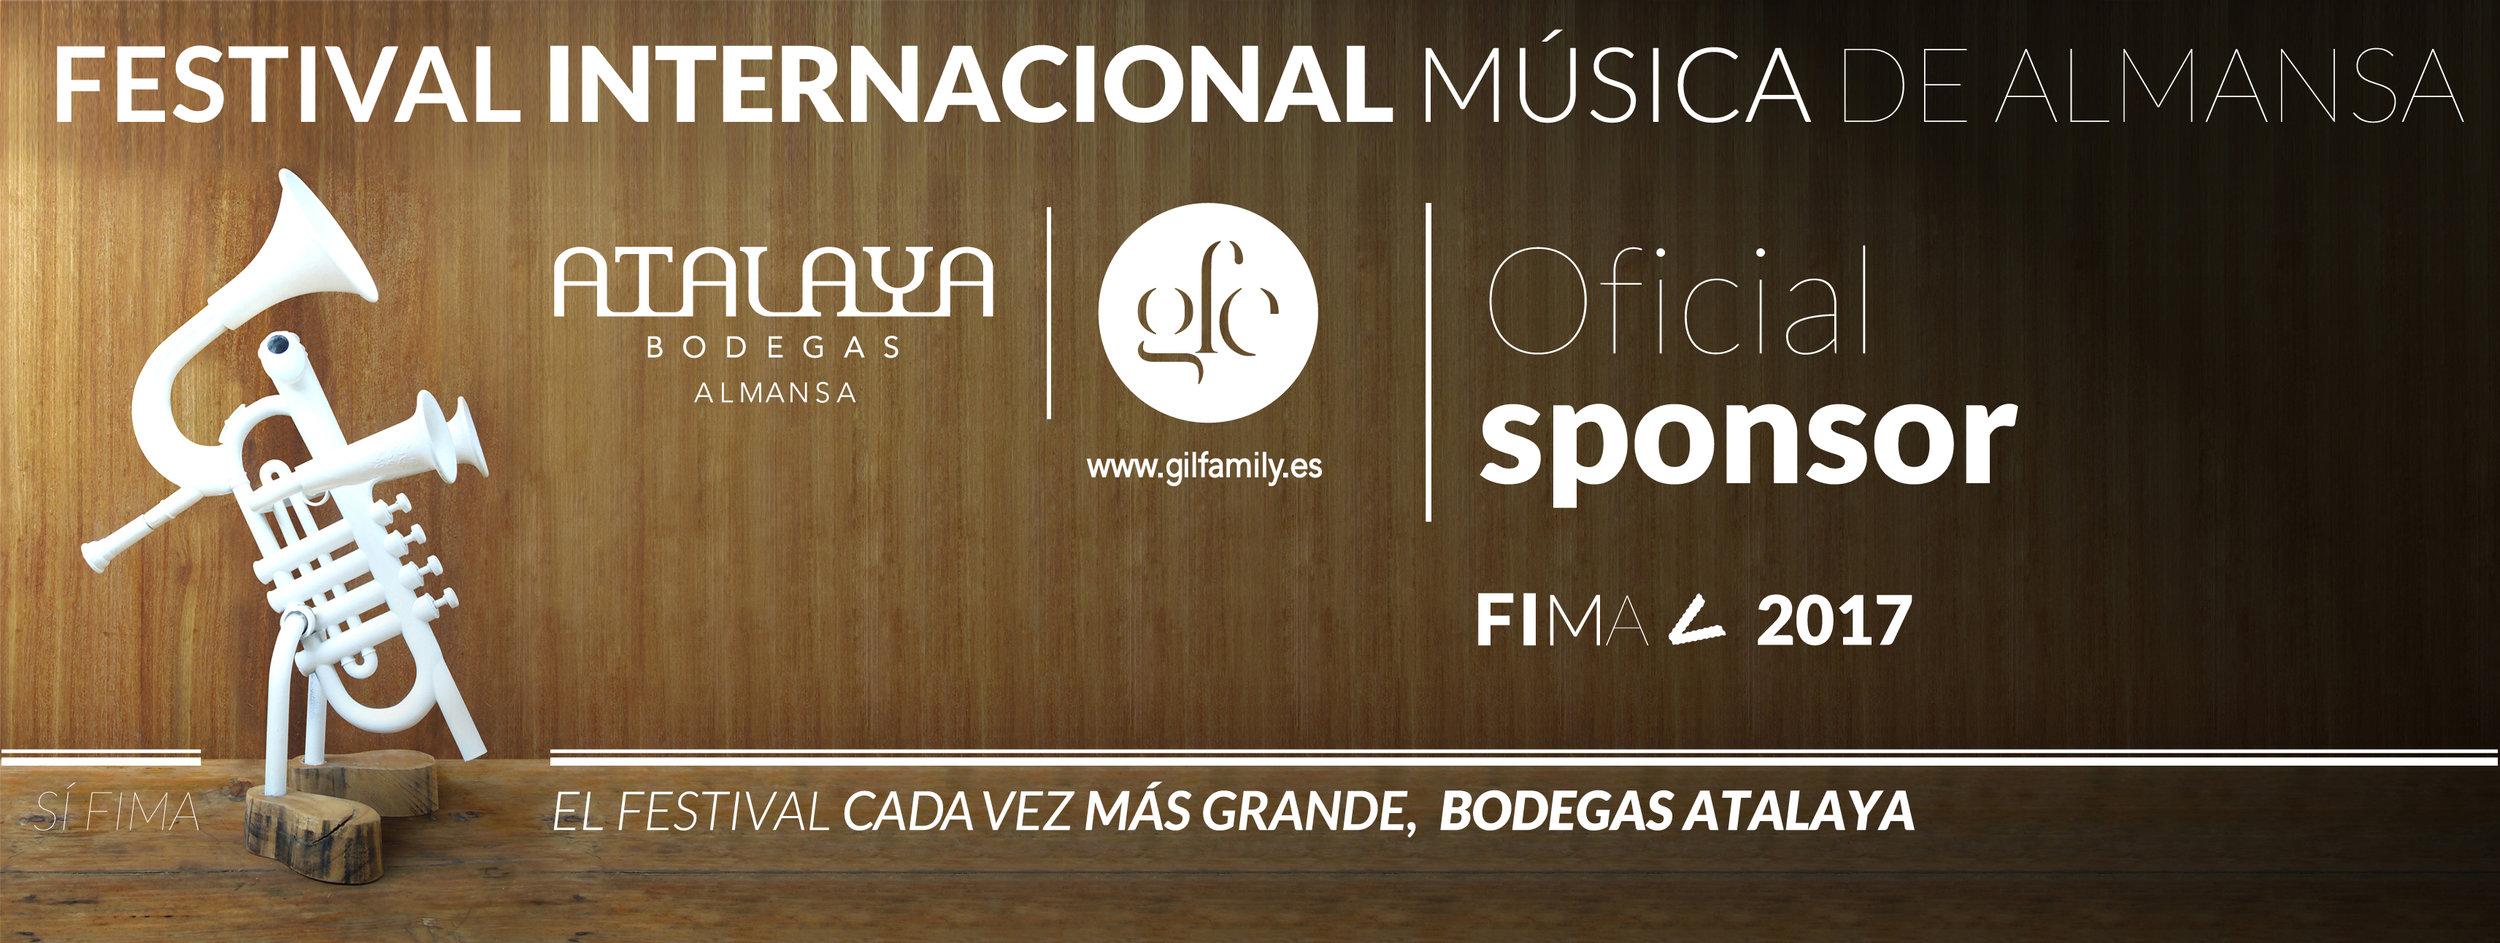 15_sponsor_atalaya.jpg